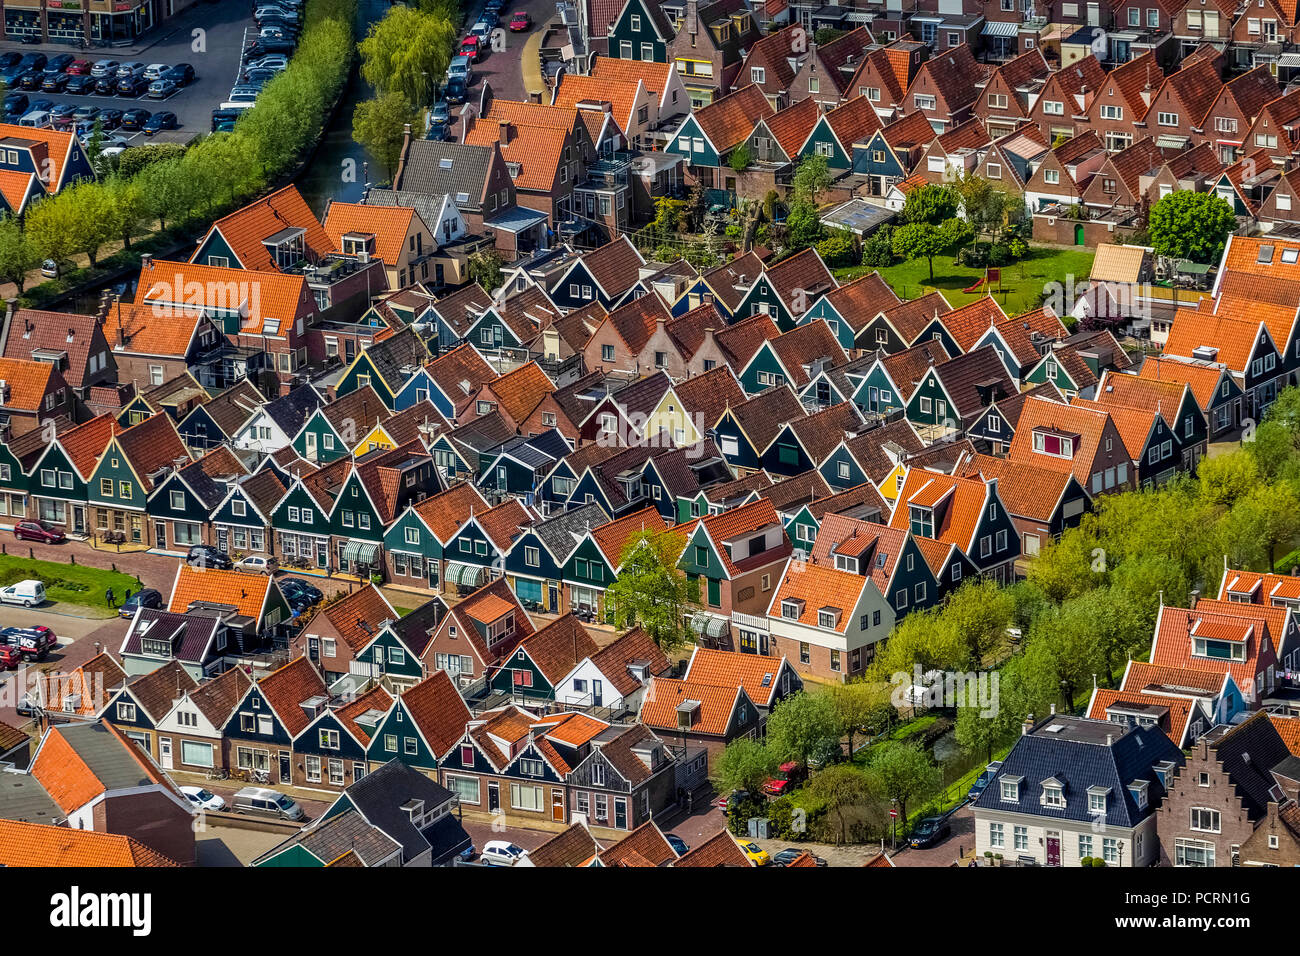 Volendam at Markermeer, North Holland, Volendam, North Holland, Netherlands - Stock Image